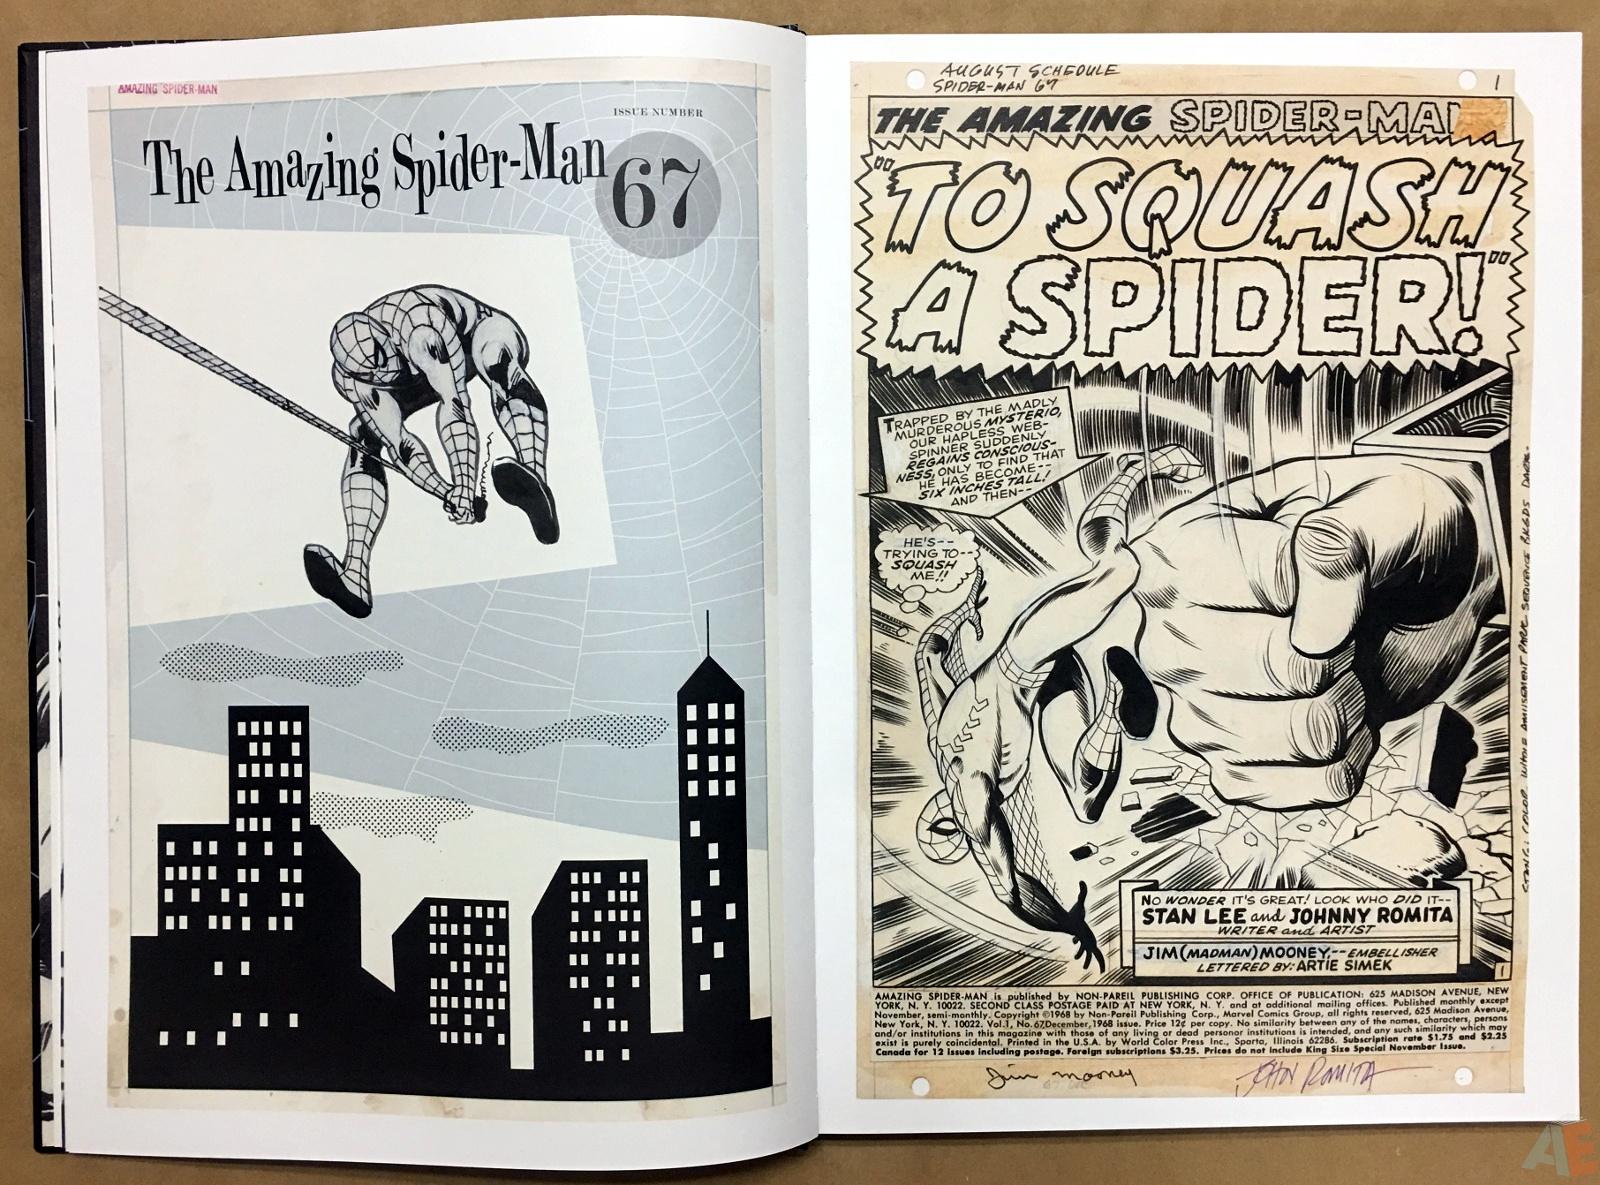 John Romita's The Amazing Spider-Man Artist's Edition 8